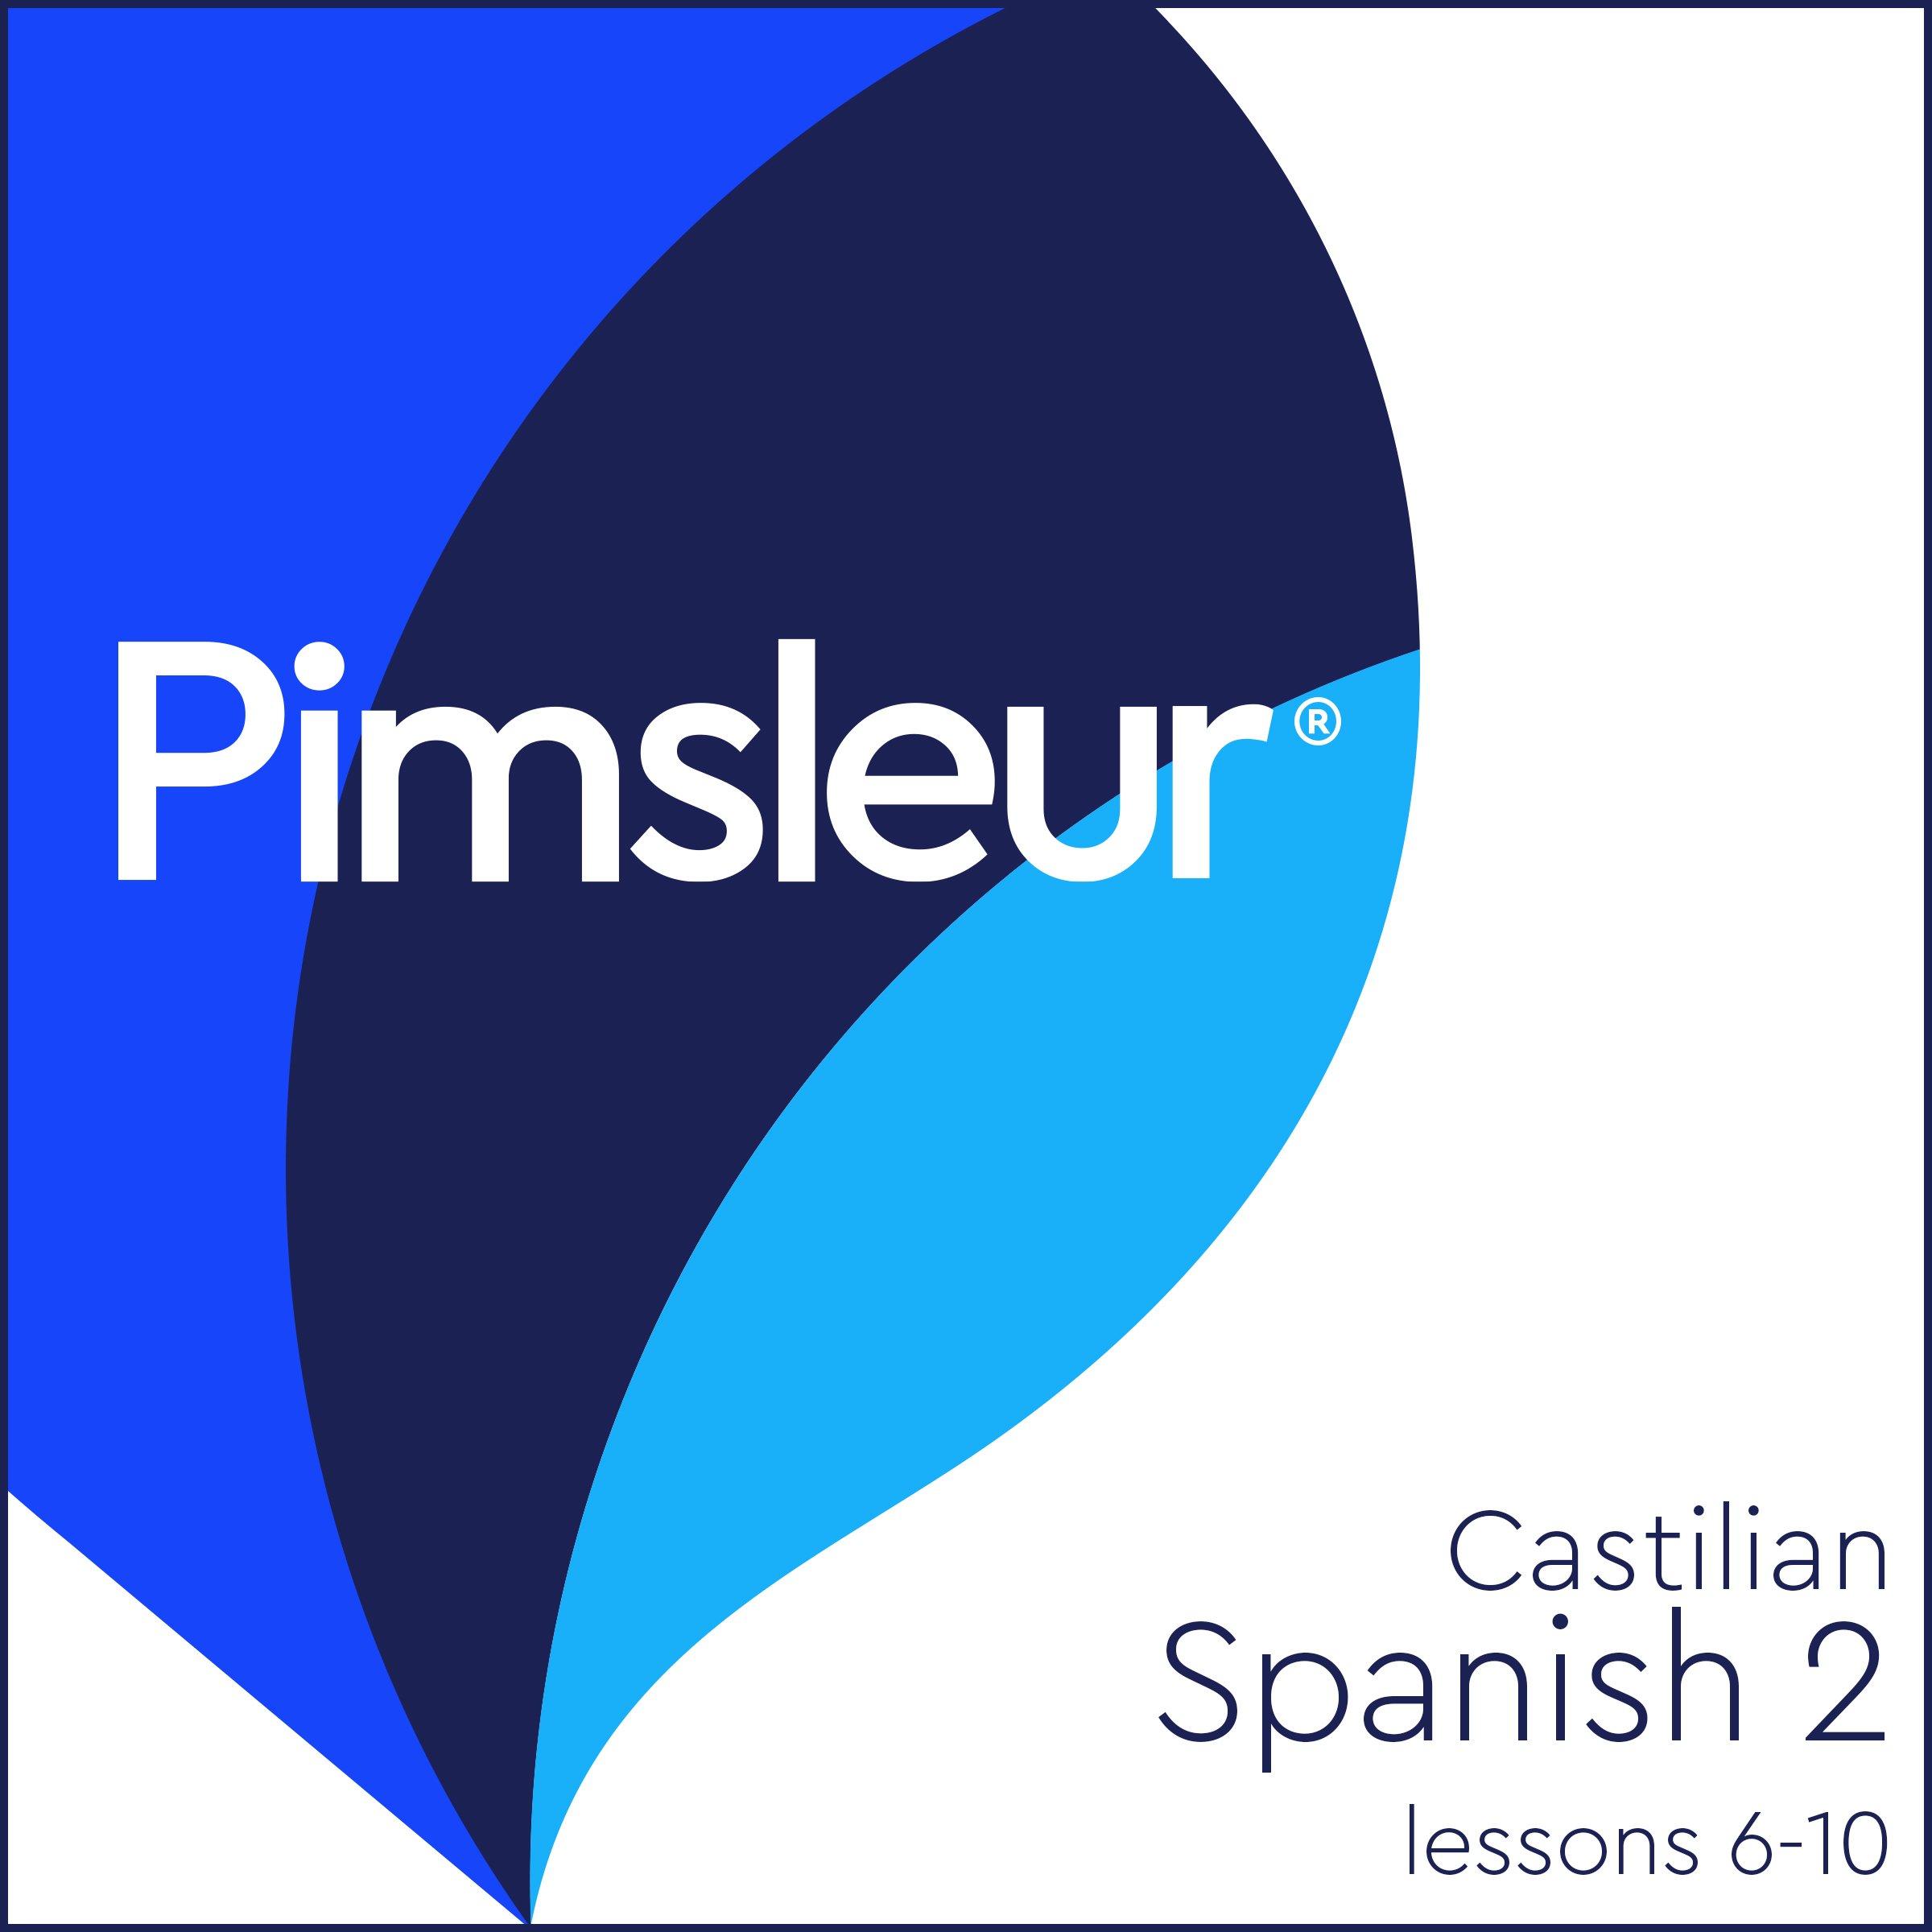 Pimsleur Spanish (Castilian) Level 2 Lessons 6-10